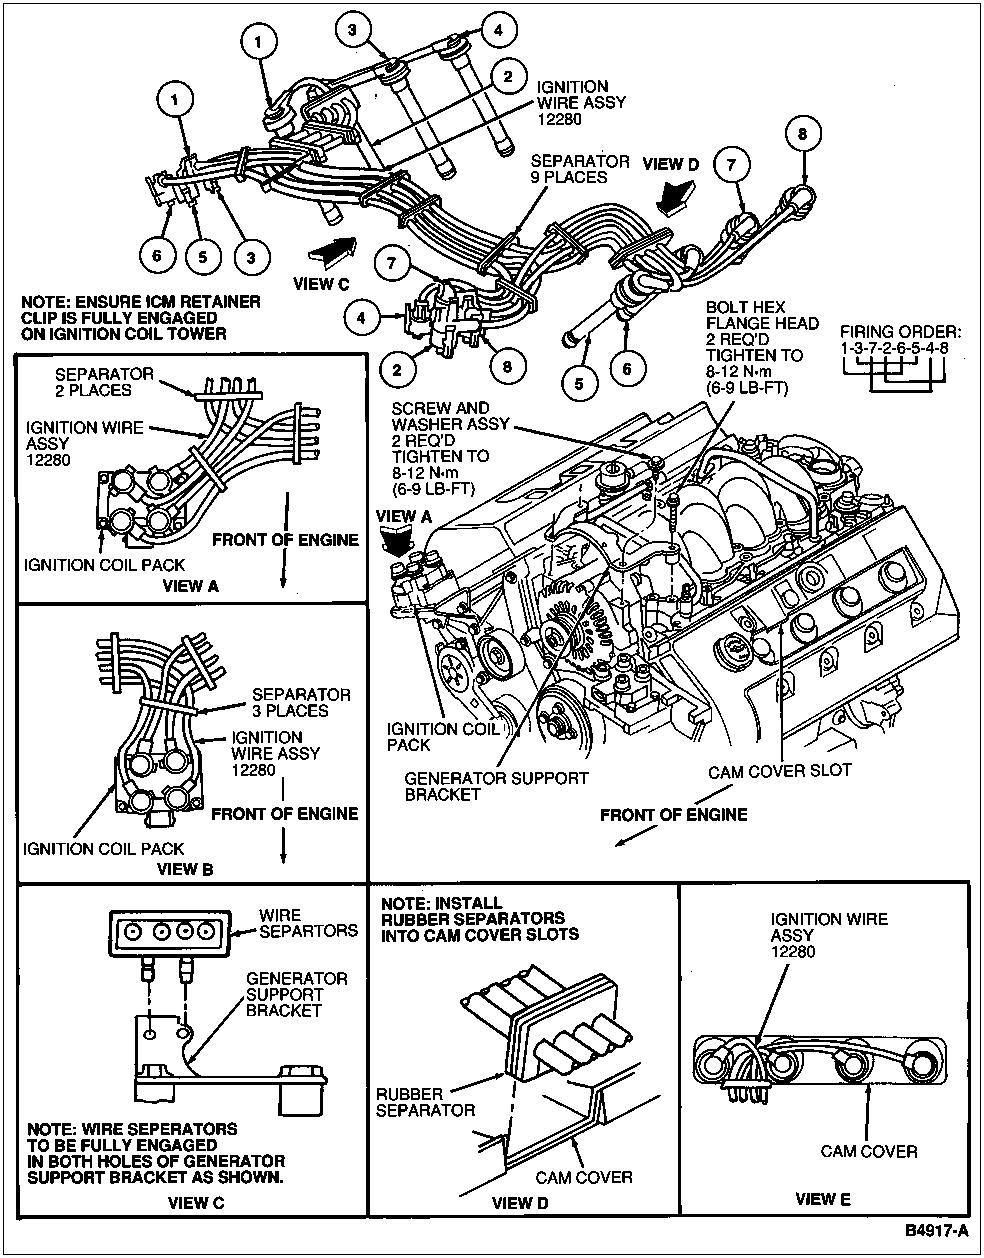 Diagram] 3000Gt Spark Plug Diagram Wiring Schematic Full